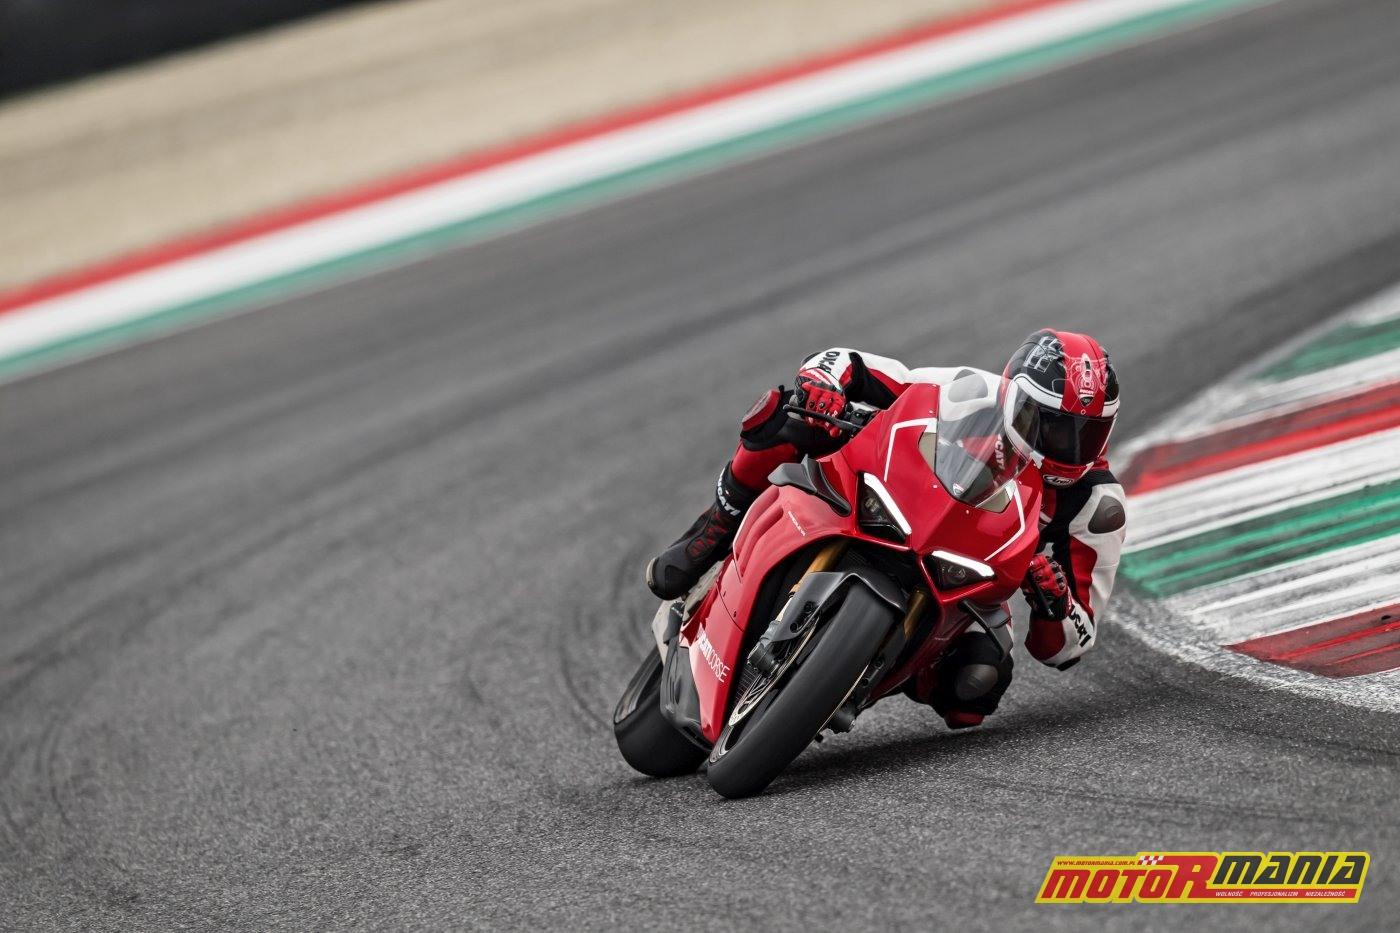 Ducati Panigale V4 R 2019 (37)